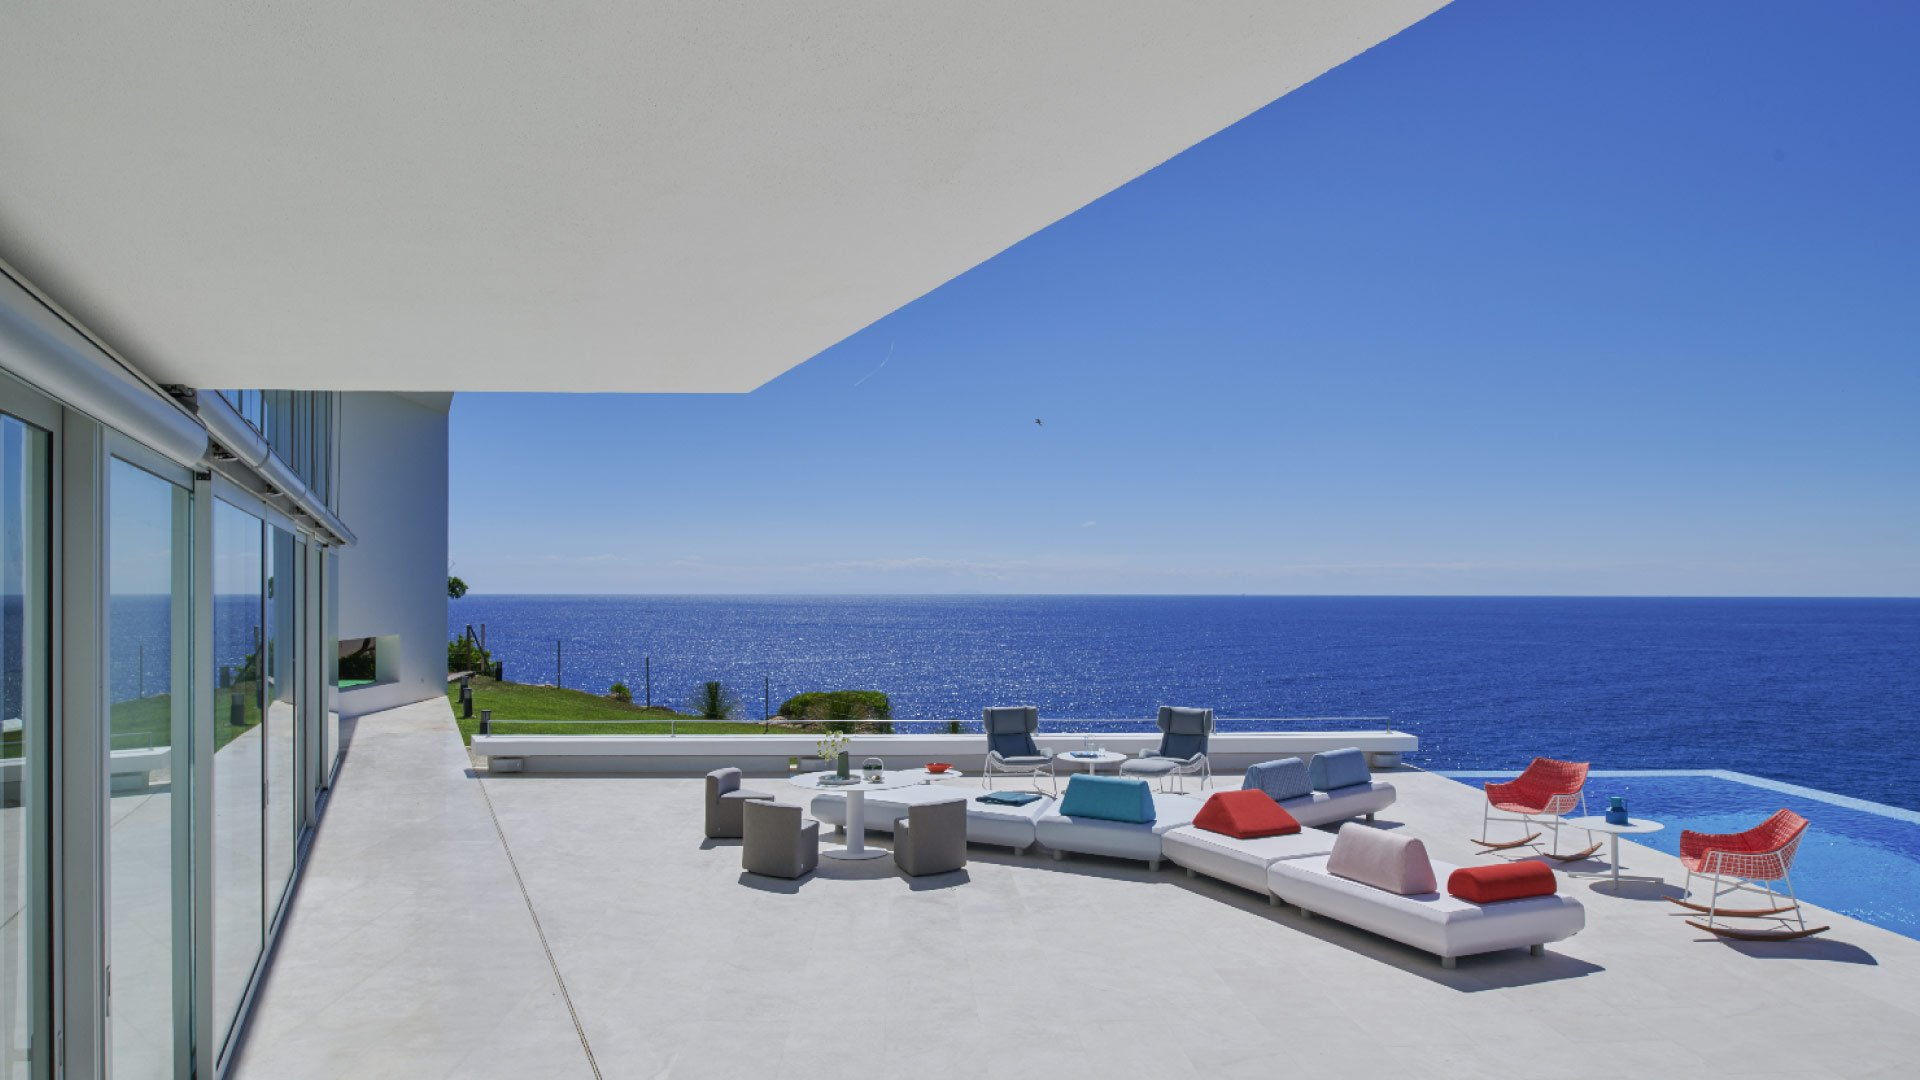 varaschin-outdoor-pays-gex-mobilier